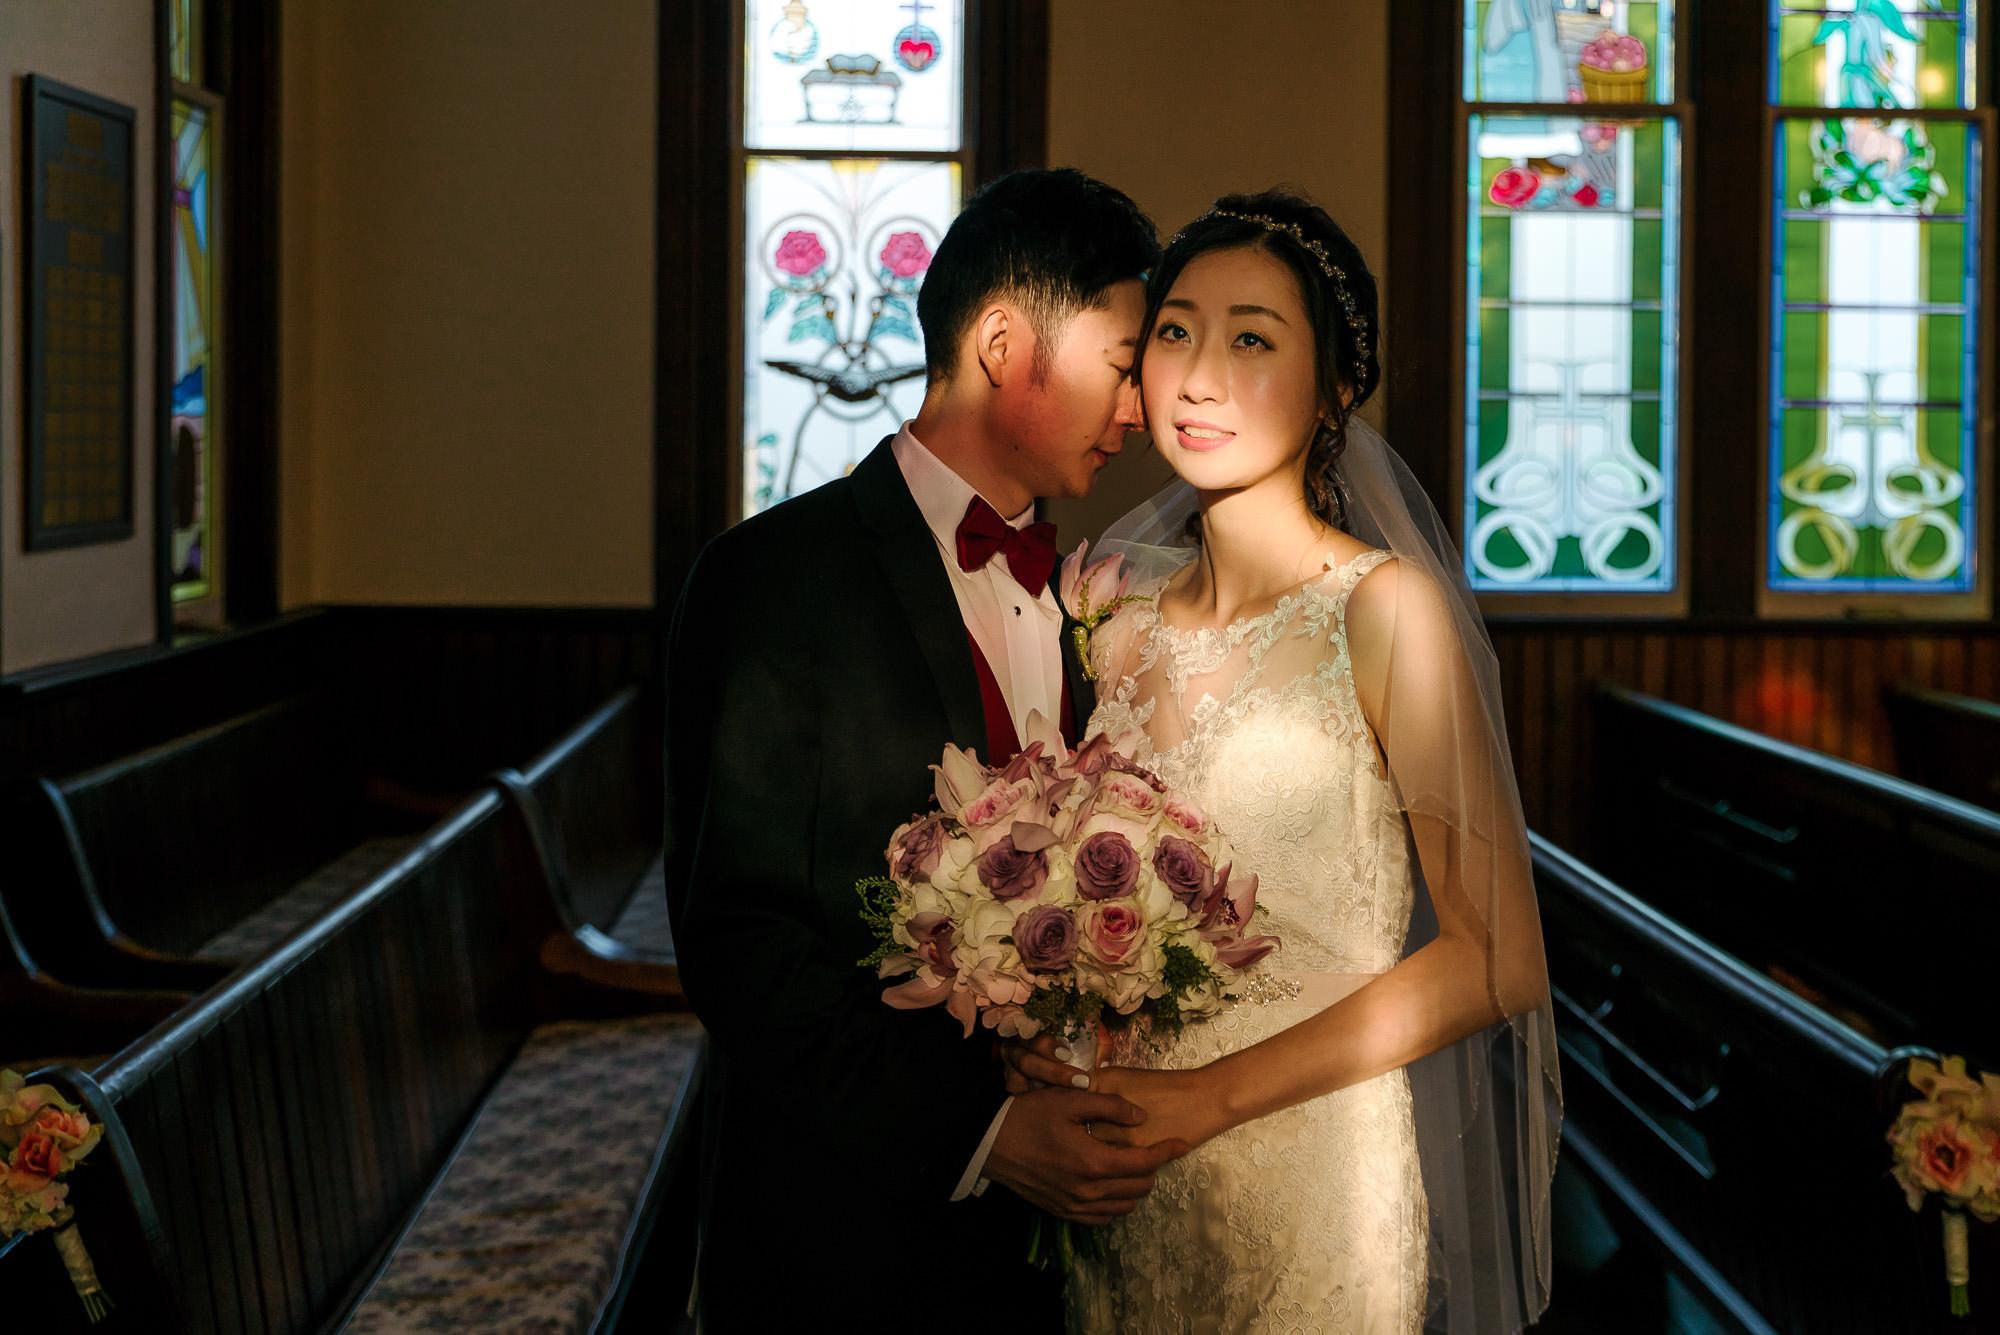 minoru_chapel_richmond_wedding_ceremony 16591918.jpg